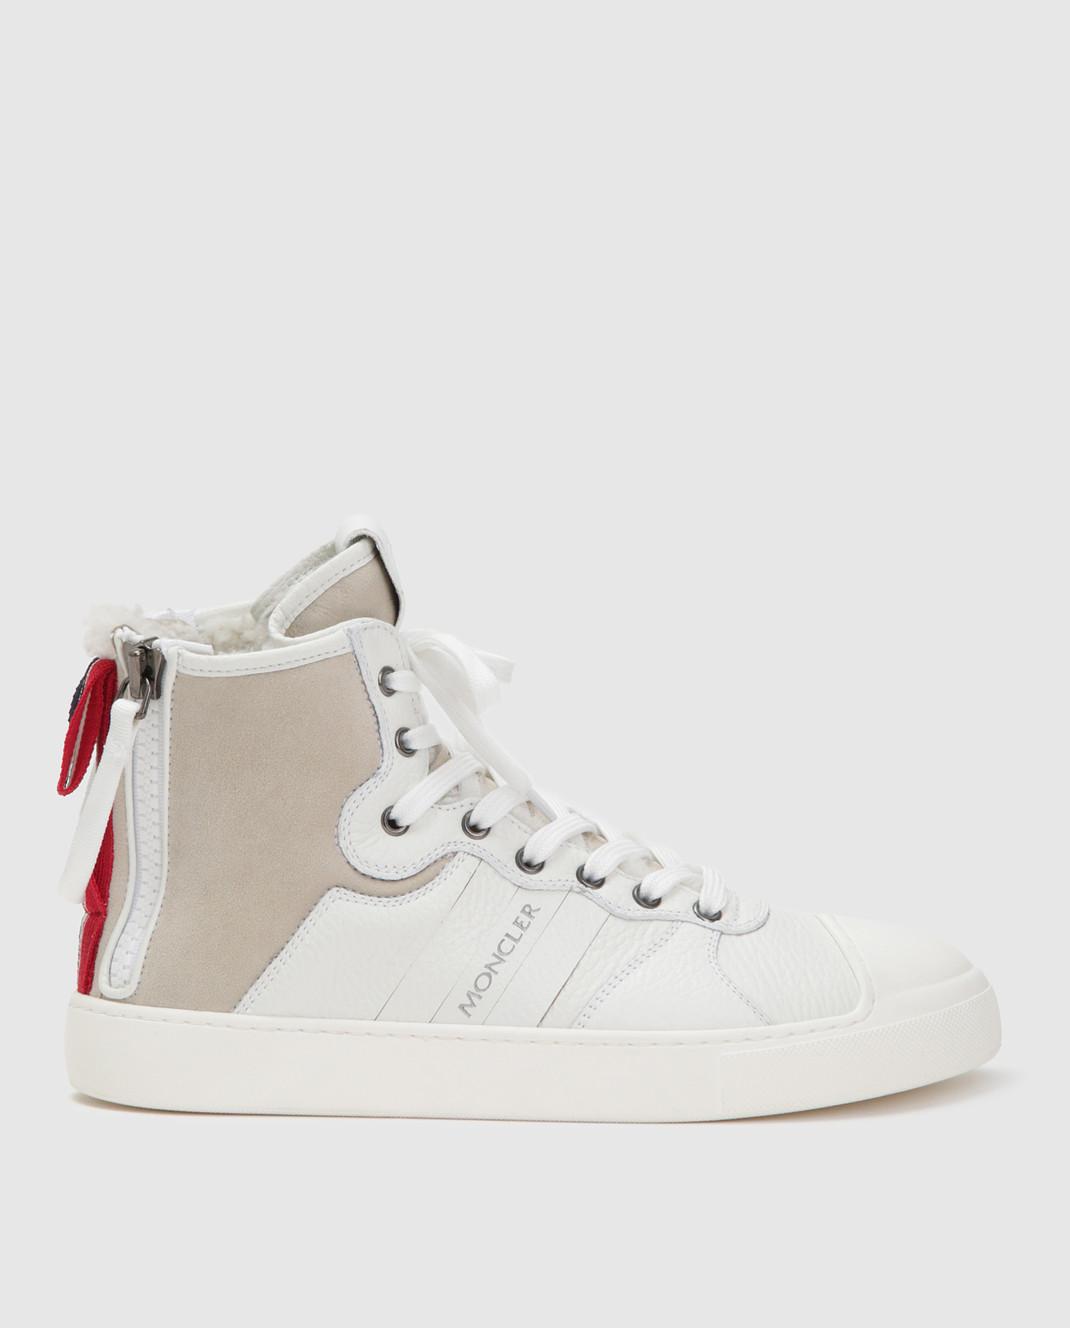 Moncler Белые кожаные хайтопы 20496